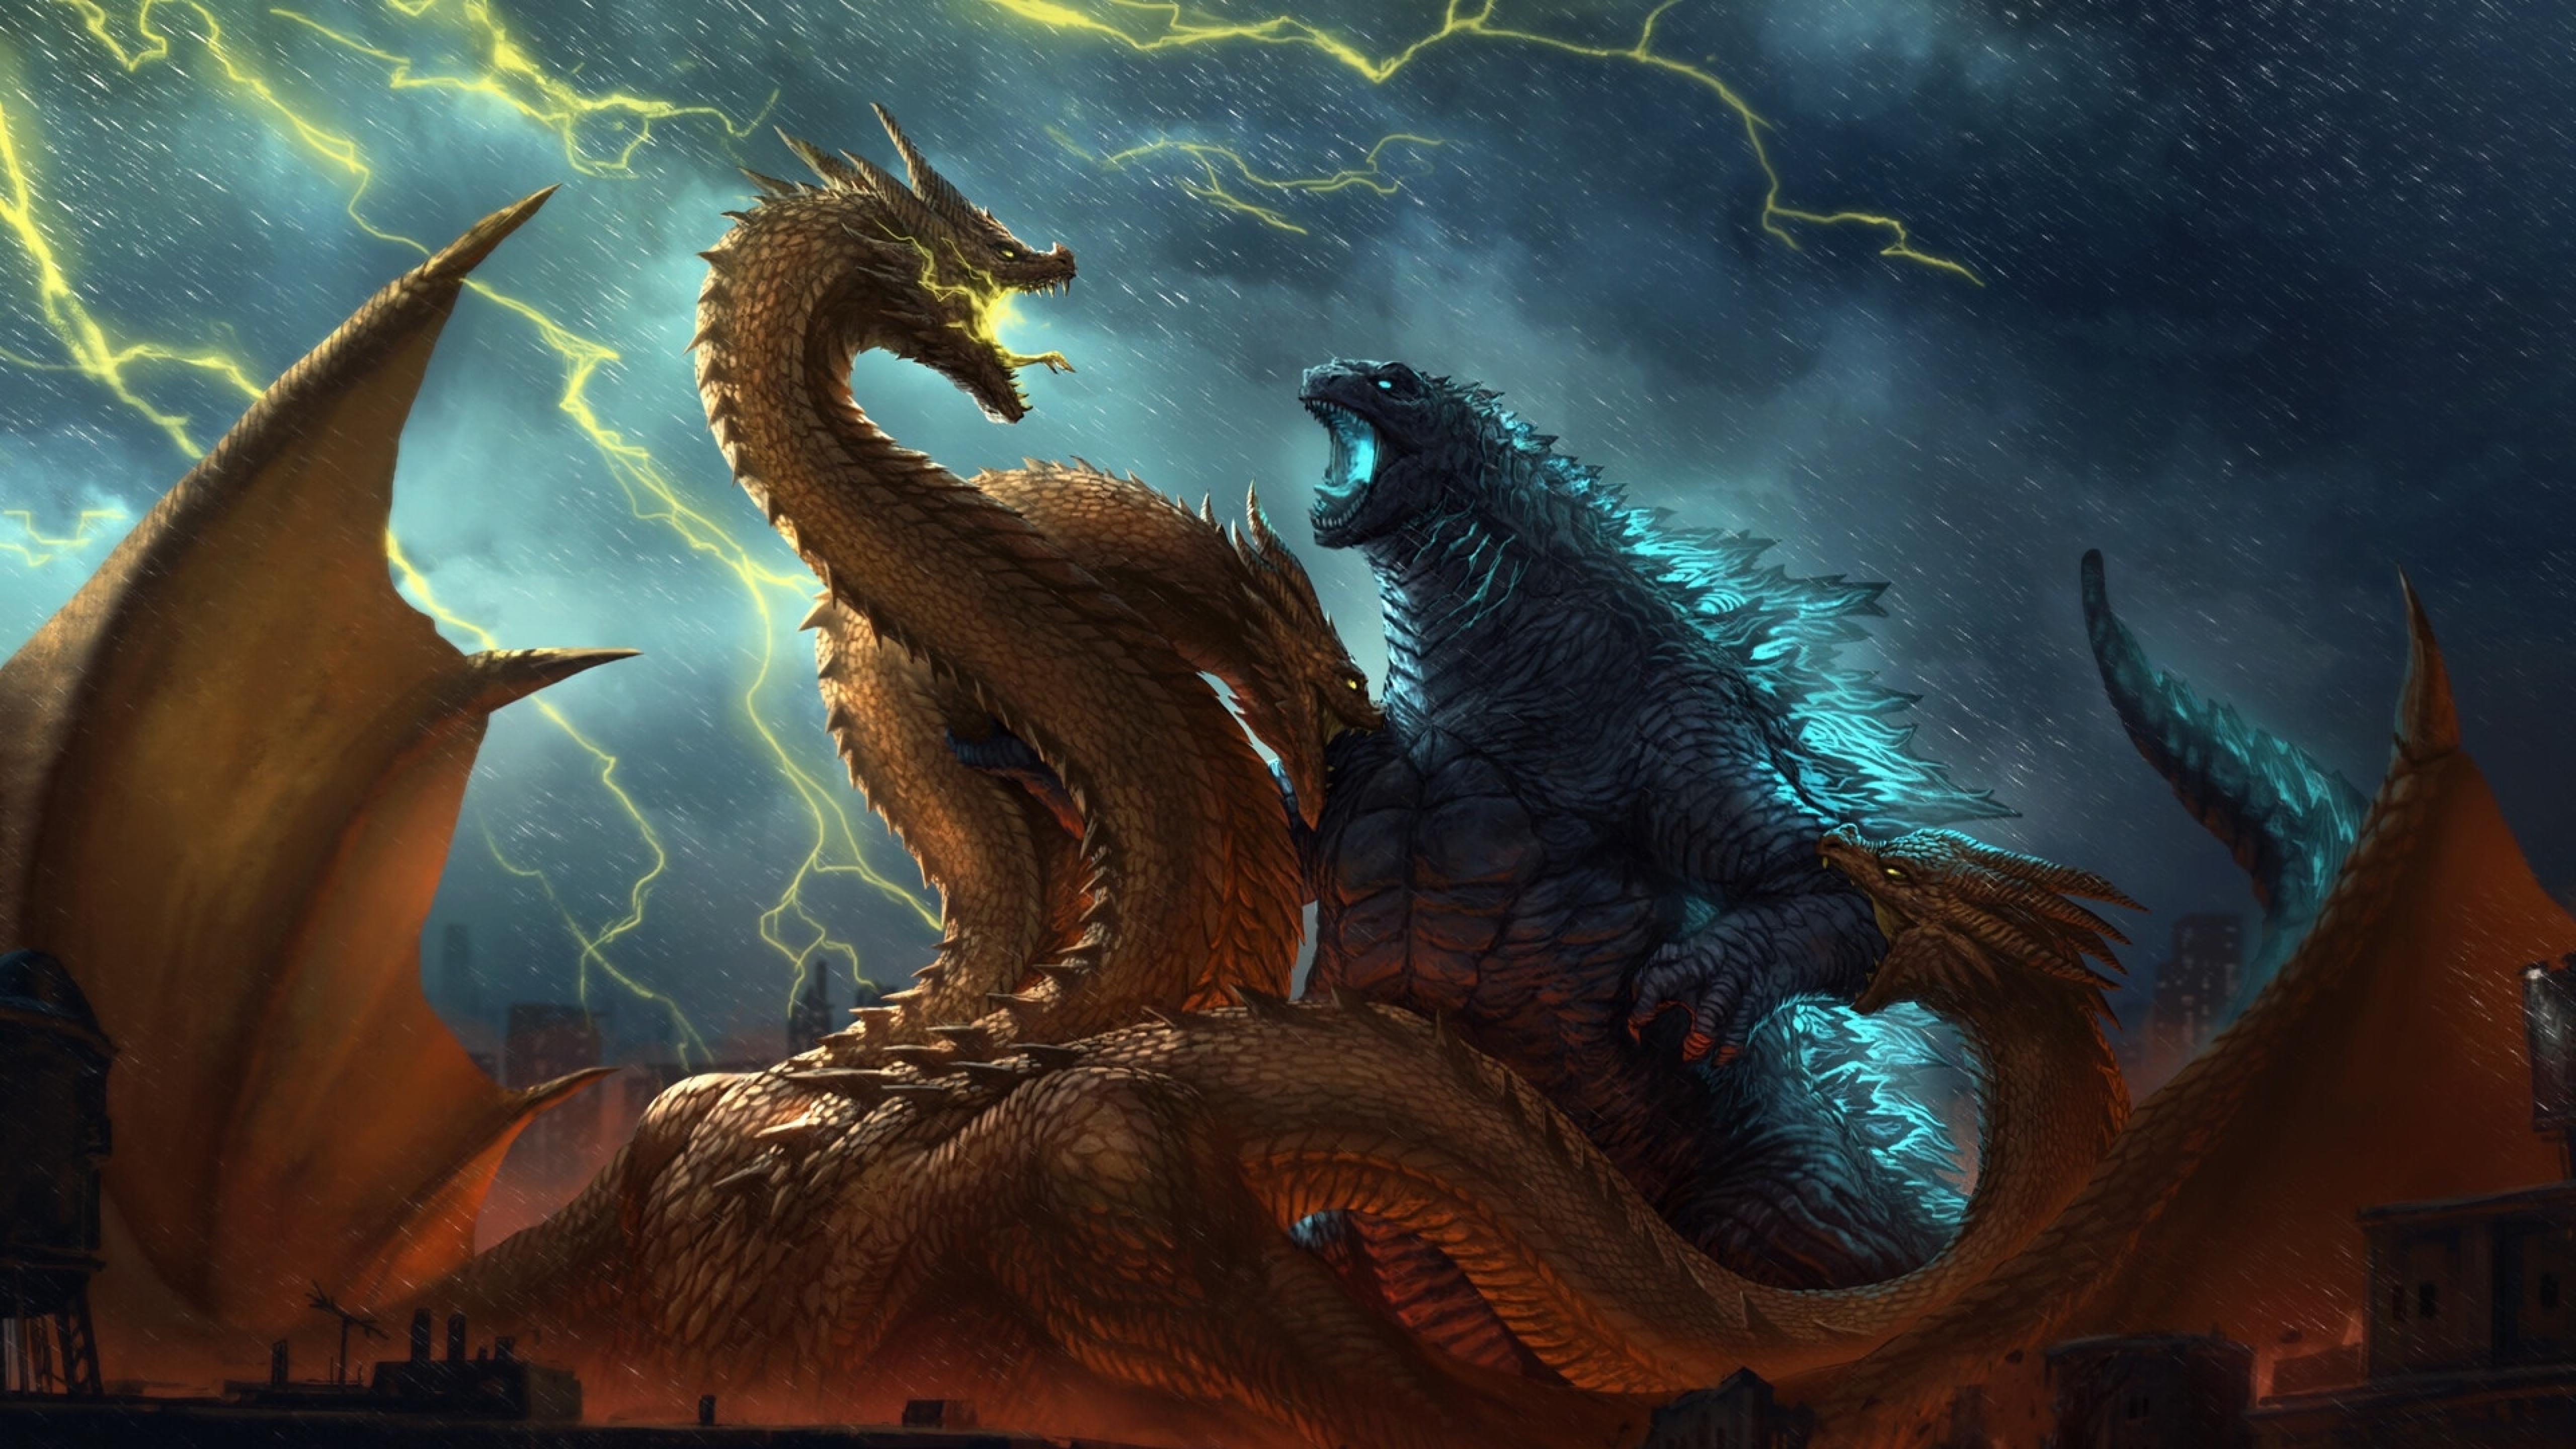 5120x2880 Godzilla Vs King Ghidorah King Of The Monsters 5k